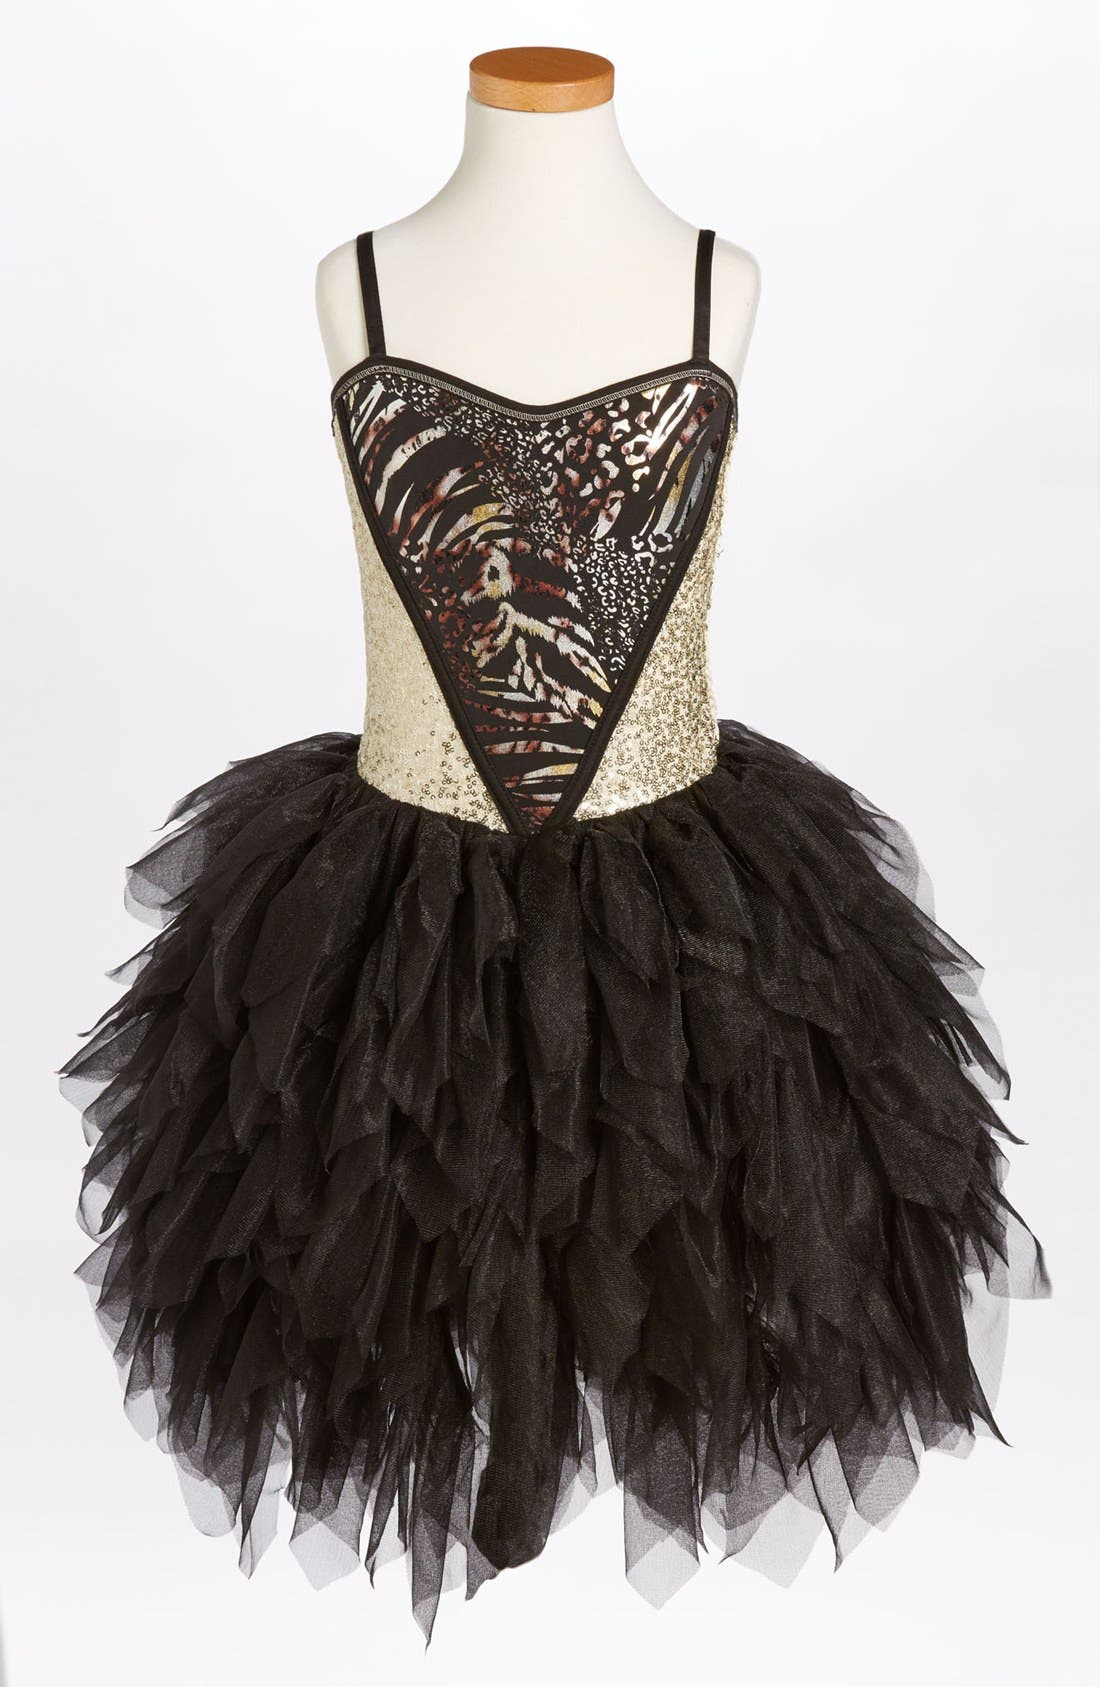 Main Image - Ooh! La, La! Couture 'Wow - Metallic' Dress (Big Girls) (Online Only)